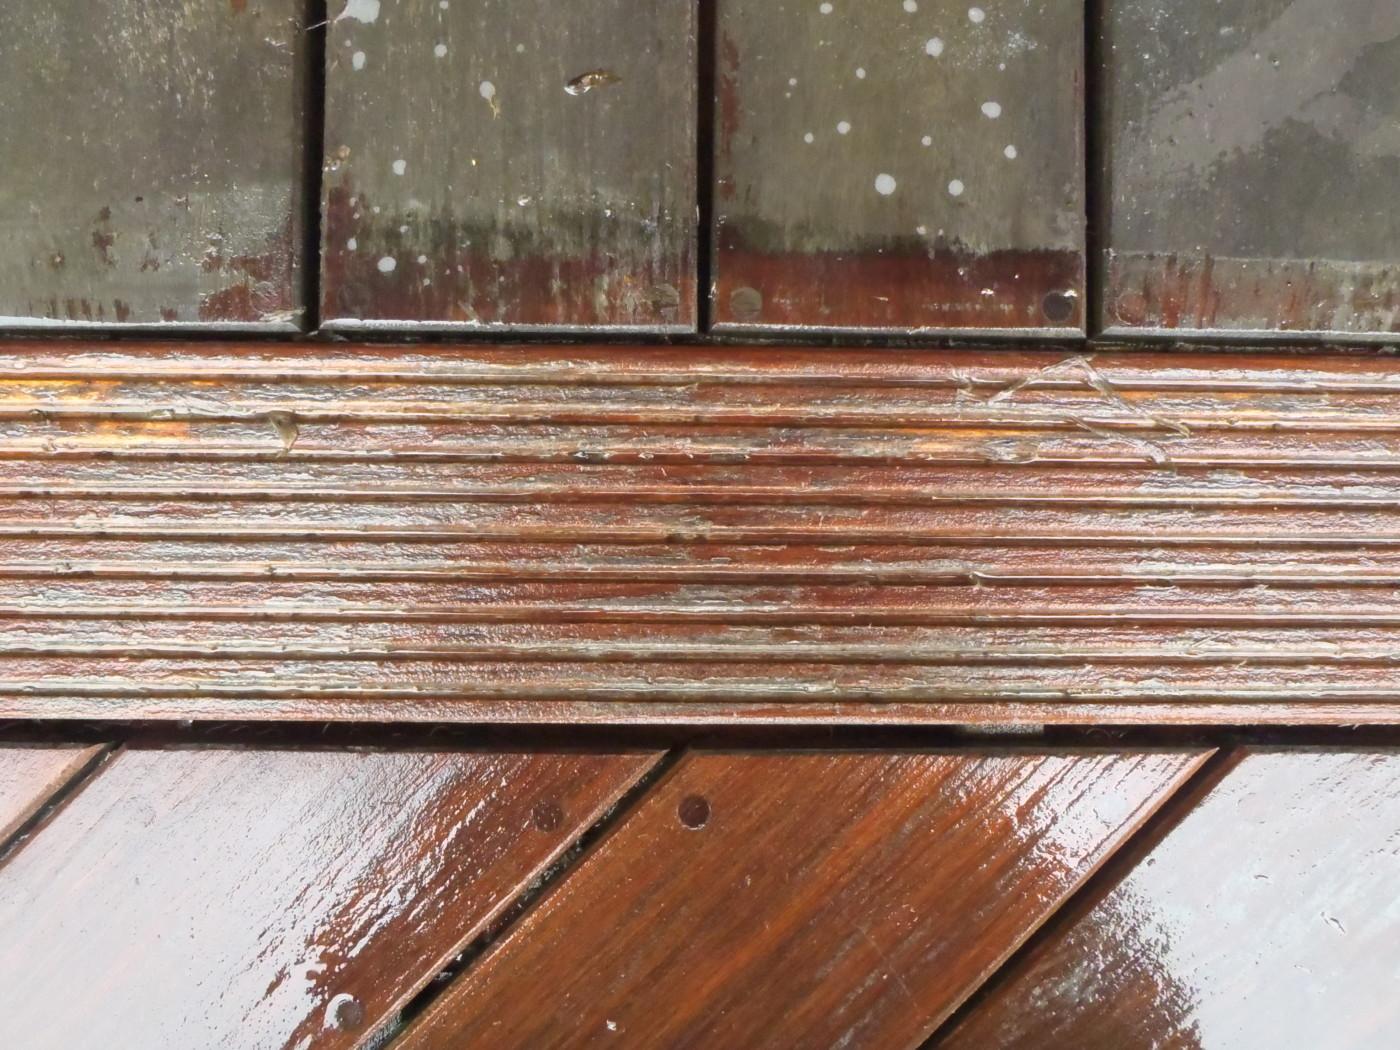 comment nettoyer terrasse bois simple comment nettoyer une terrasse en bois with comment. Black Bedroom Furniture Sets. Home Design Ideas